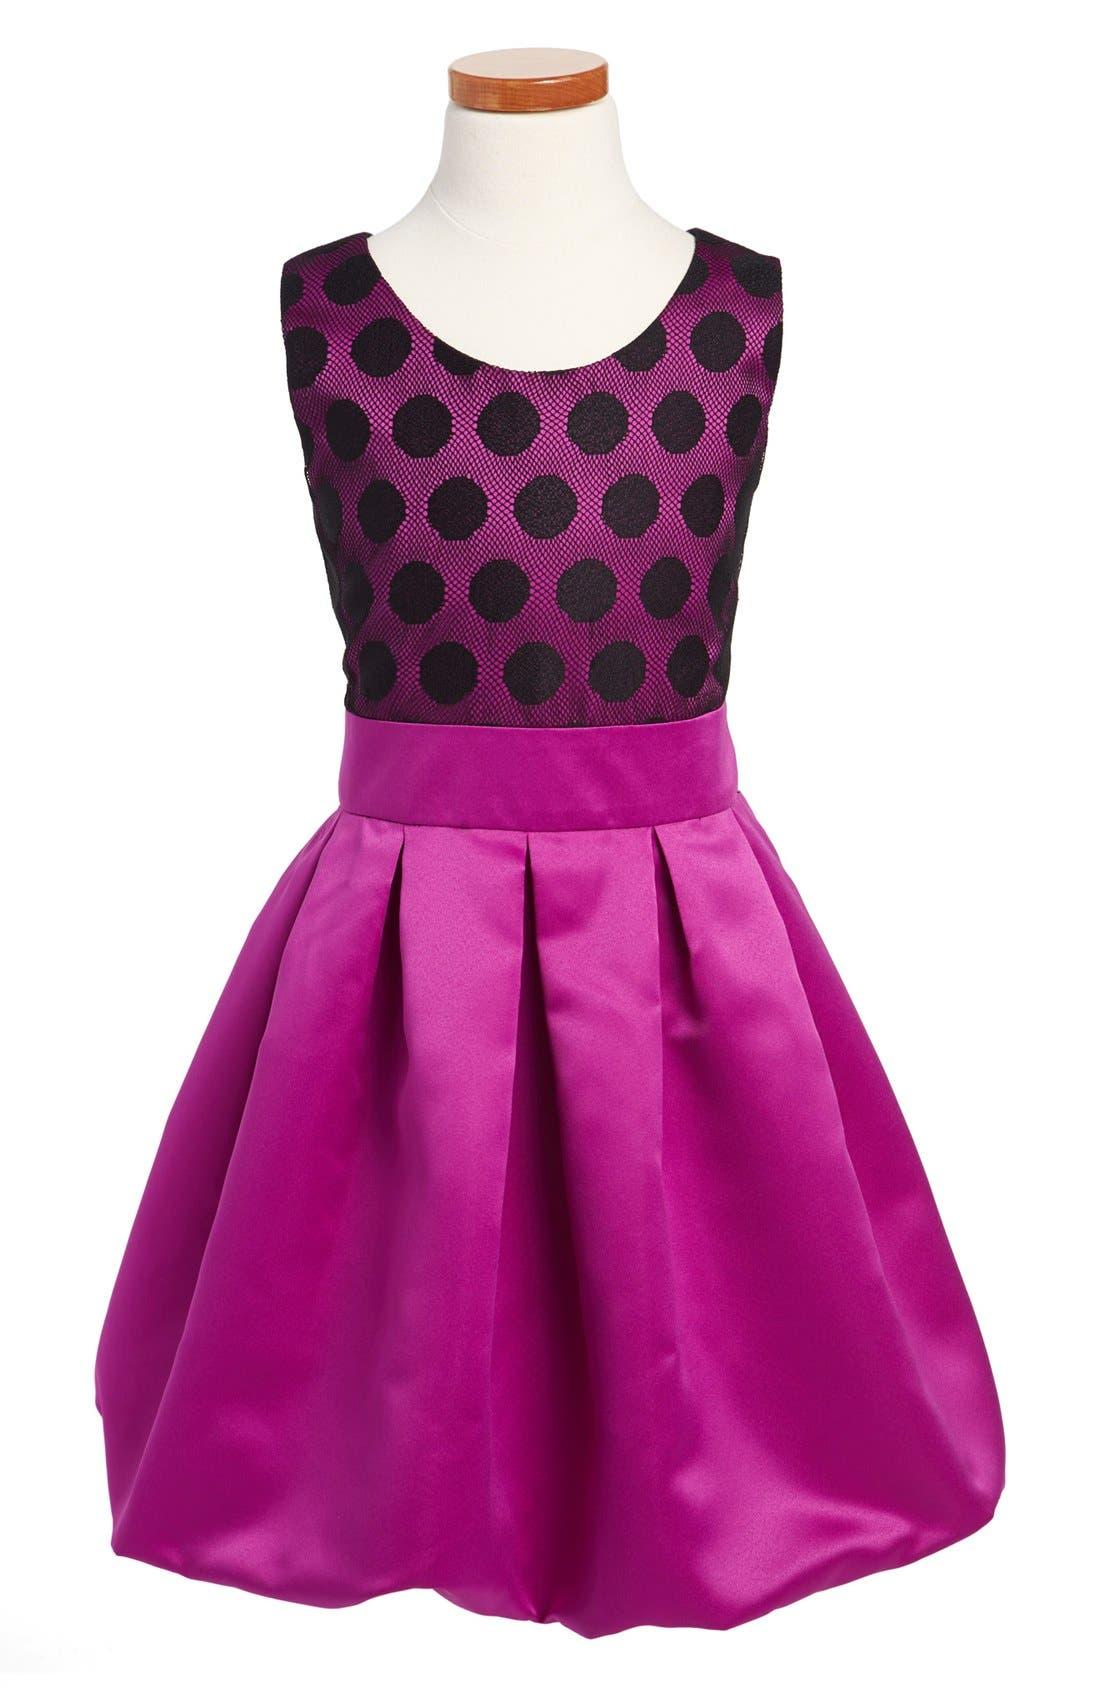 Main Image - Zoe Ltd Dot Satin Bubble Dress (Big Girls)